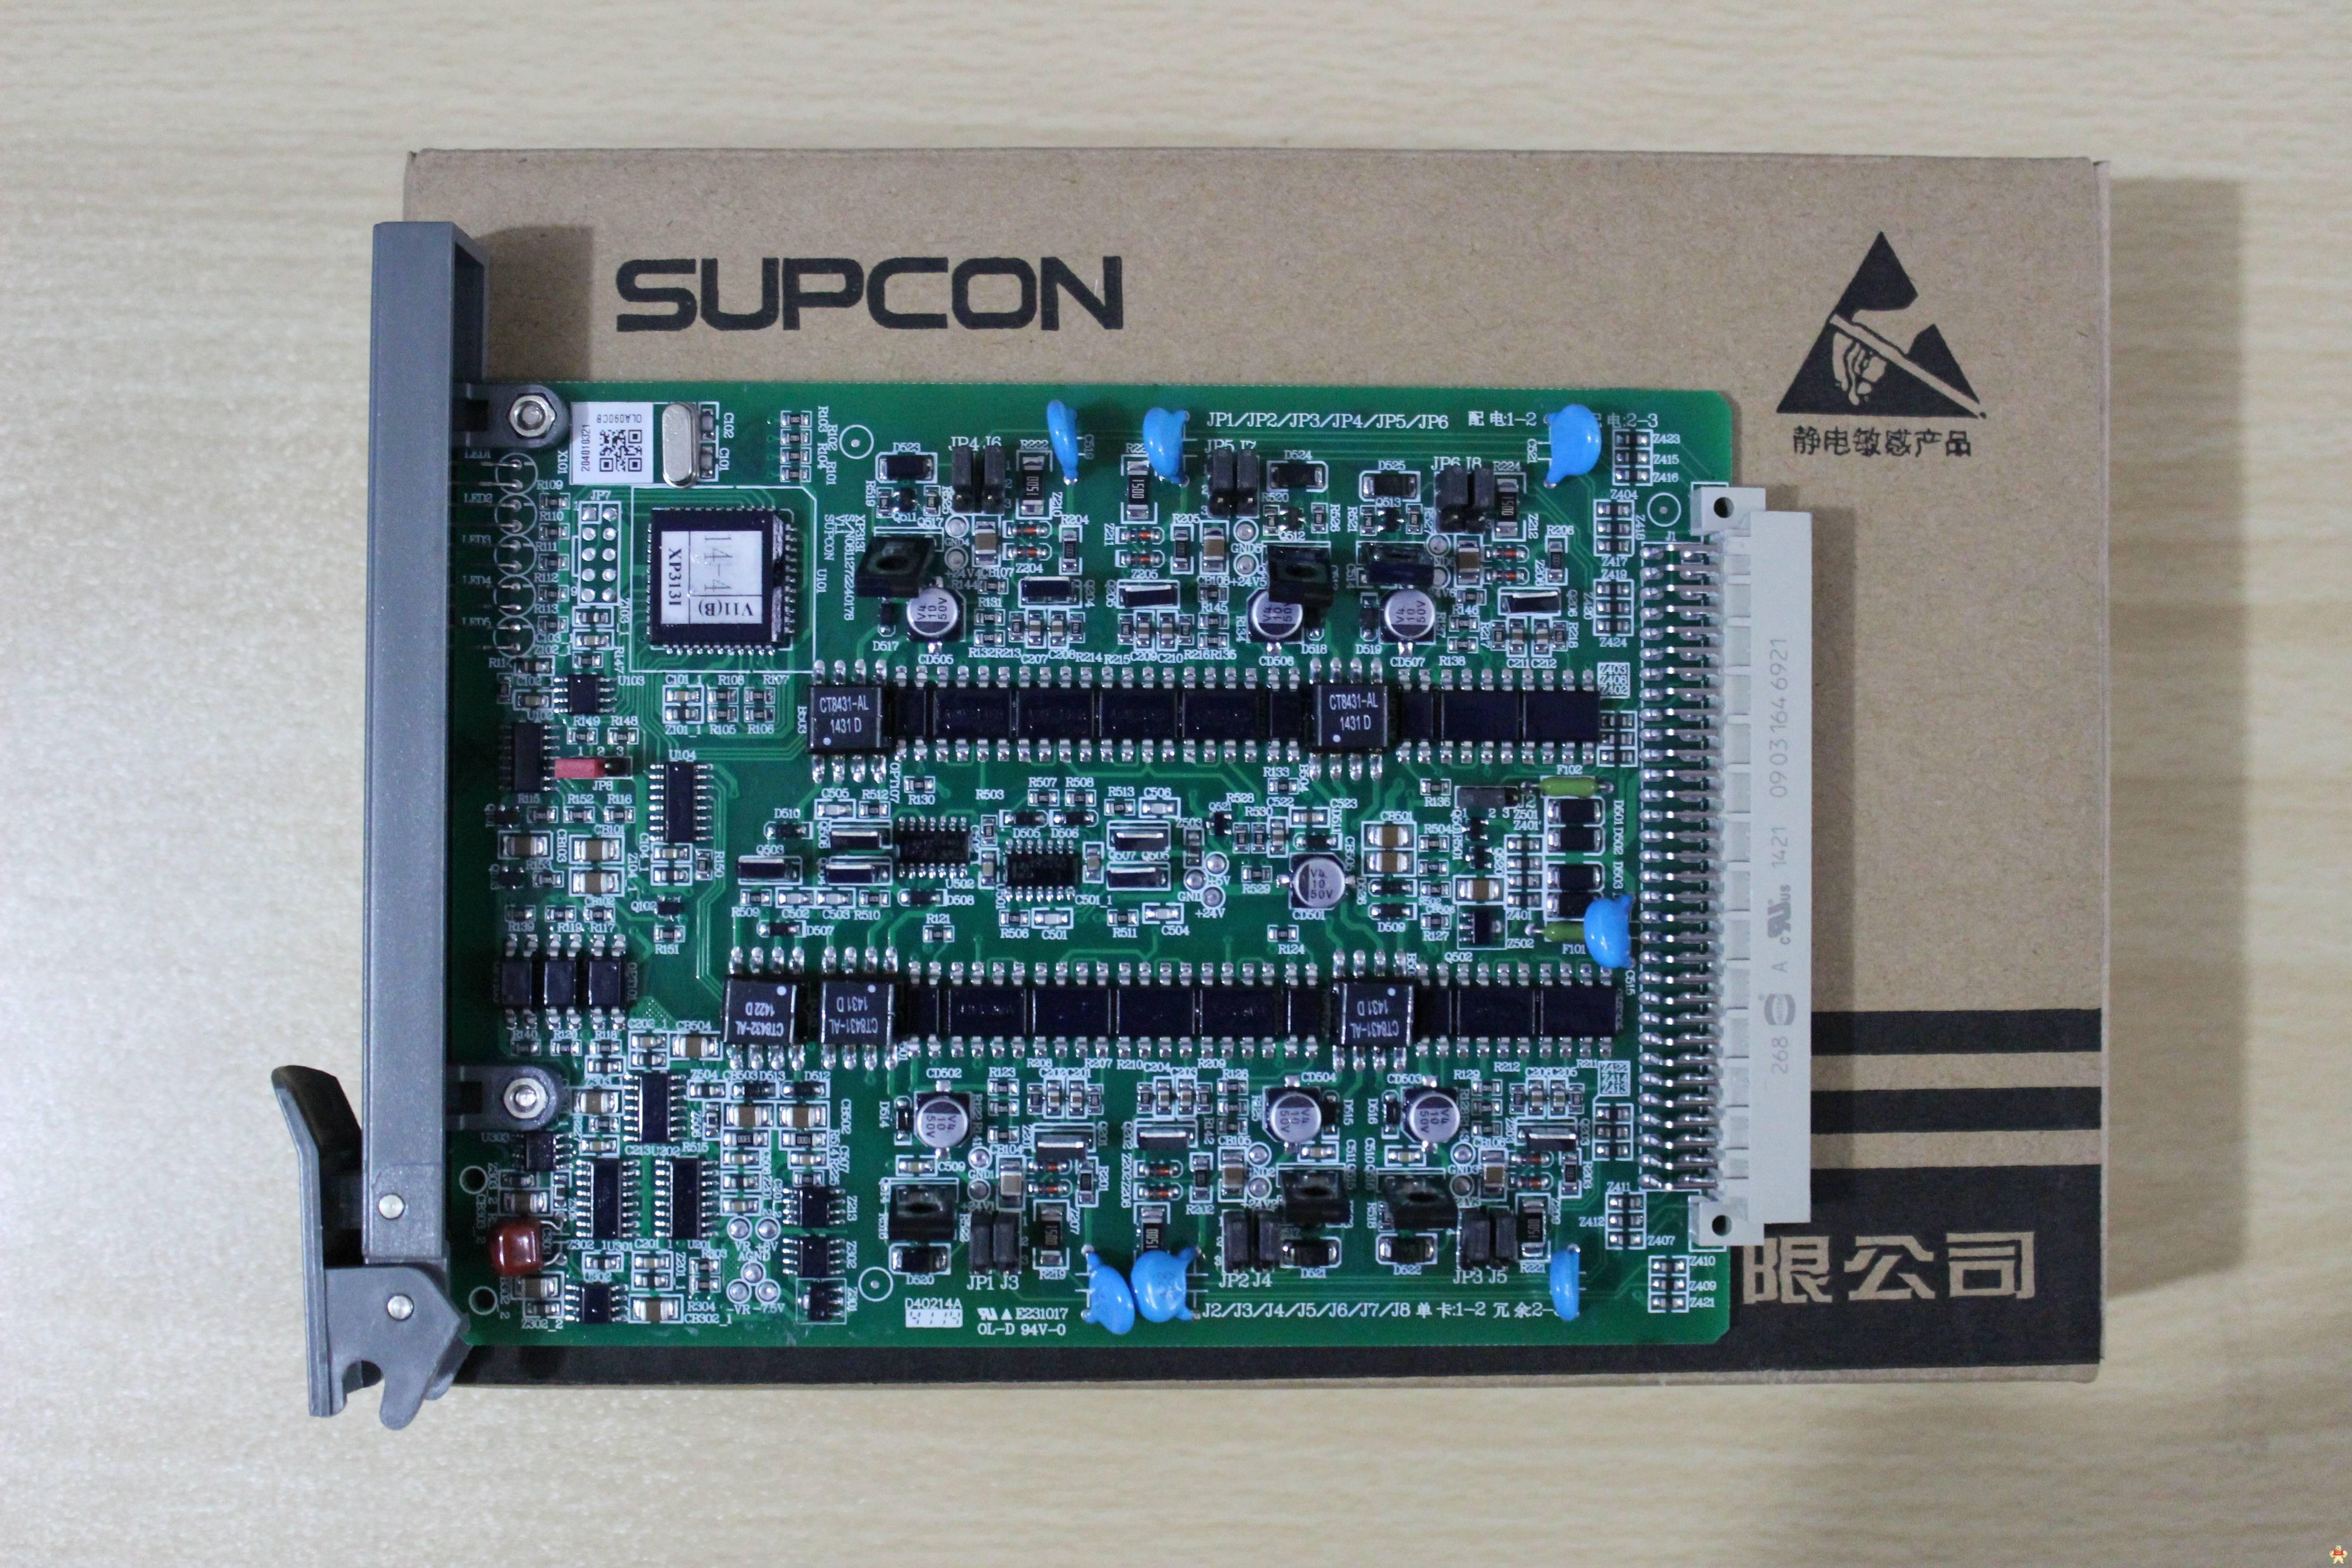 XP313热销  6路电流信号输入卡件 全新 XP313价格,XP313卡件,中控XP313,浙江中控,卡件XP313